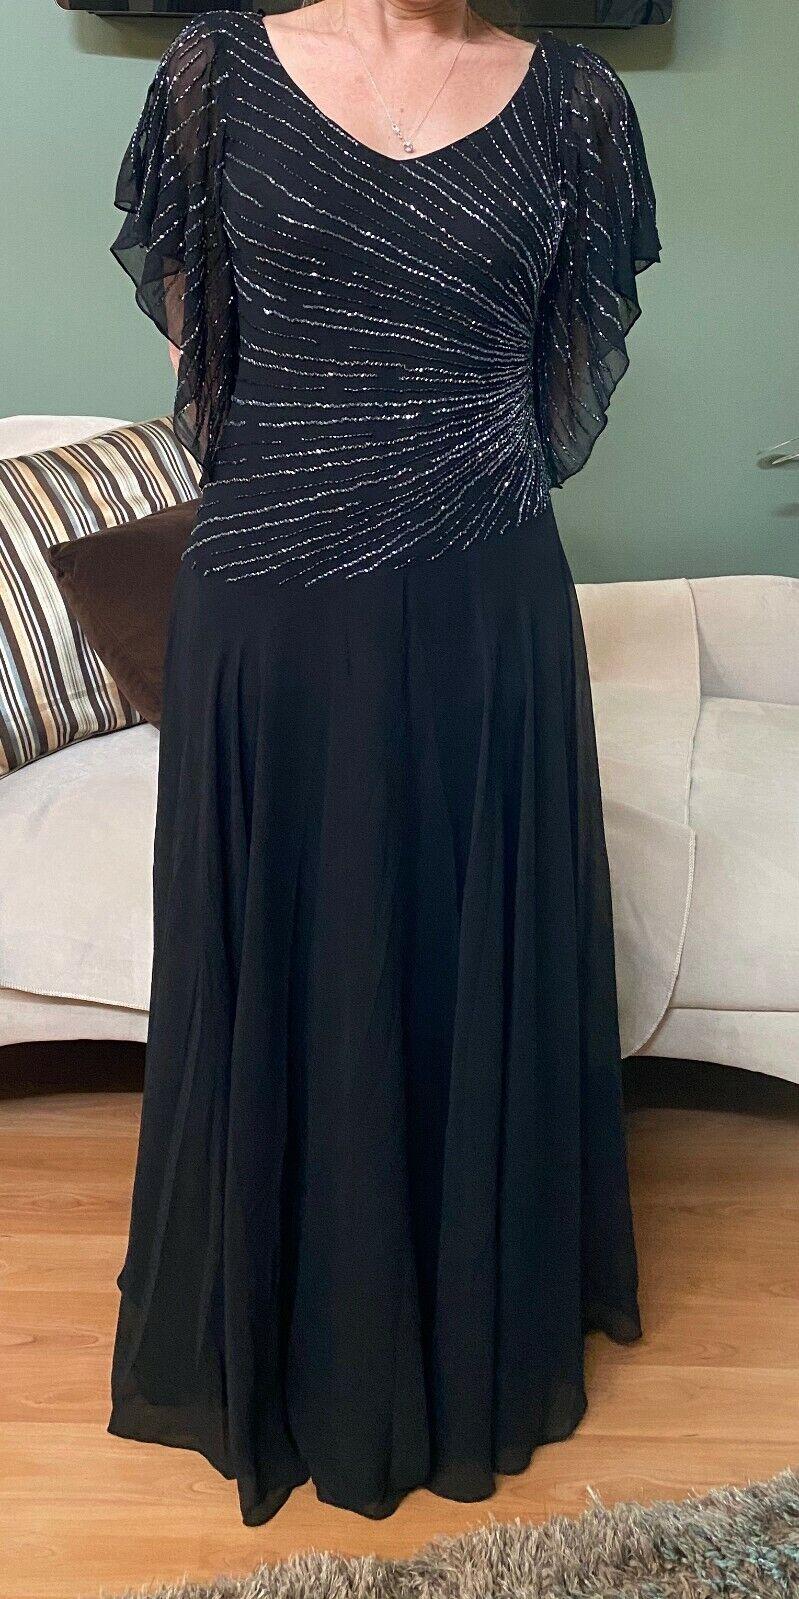 NWT J Kara Black Chiffon Gown with Starburst bead design ~ Size 8